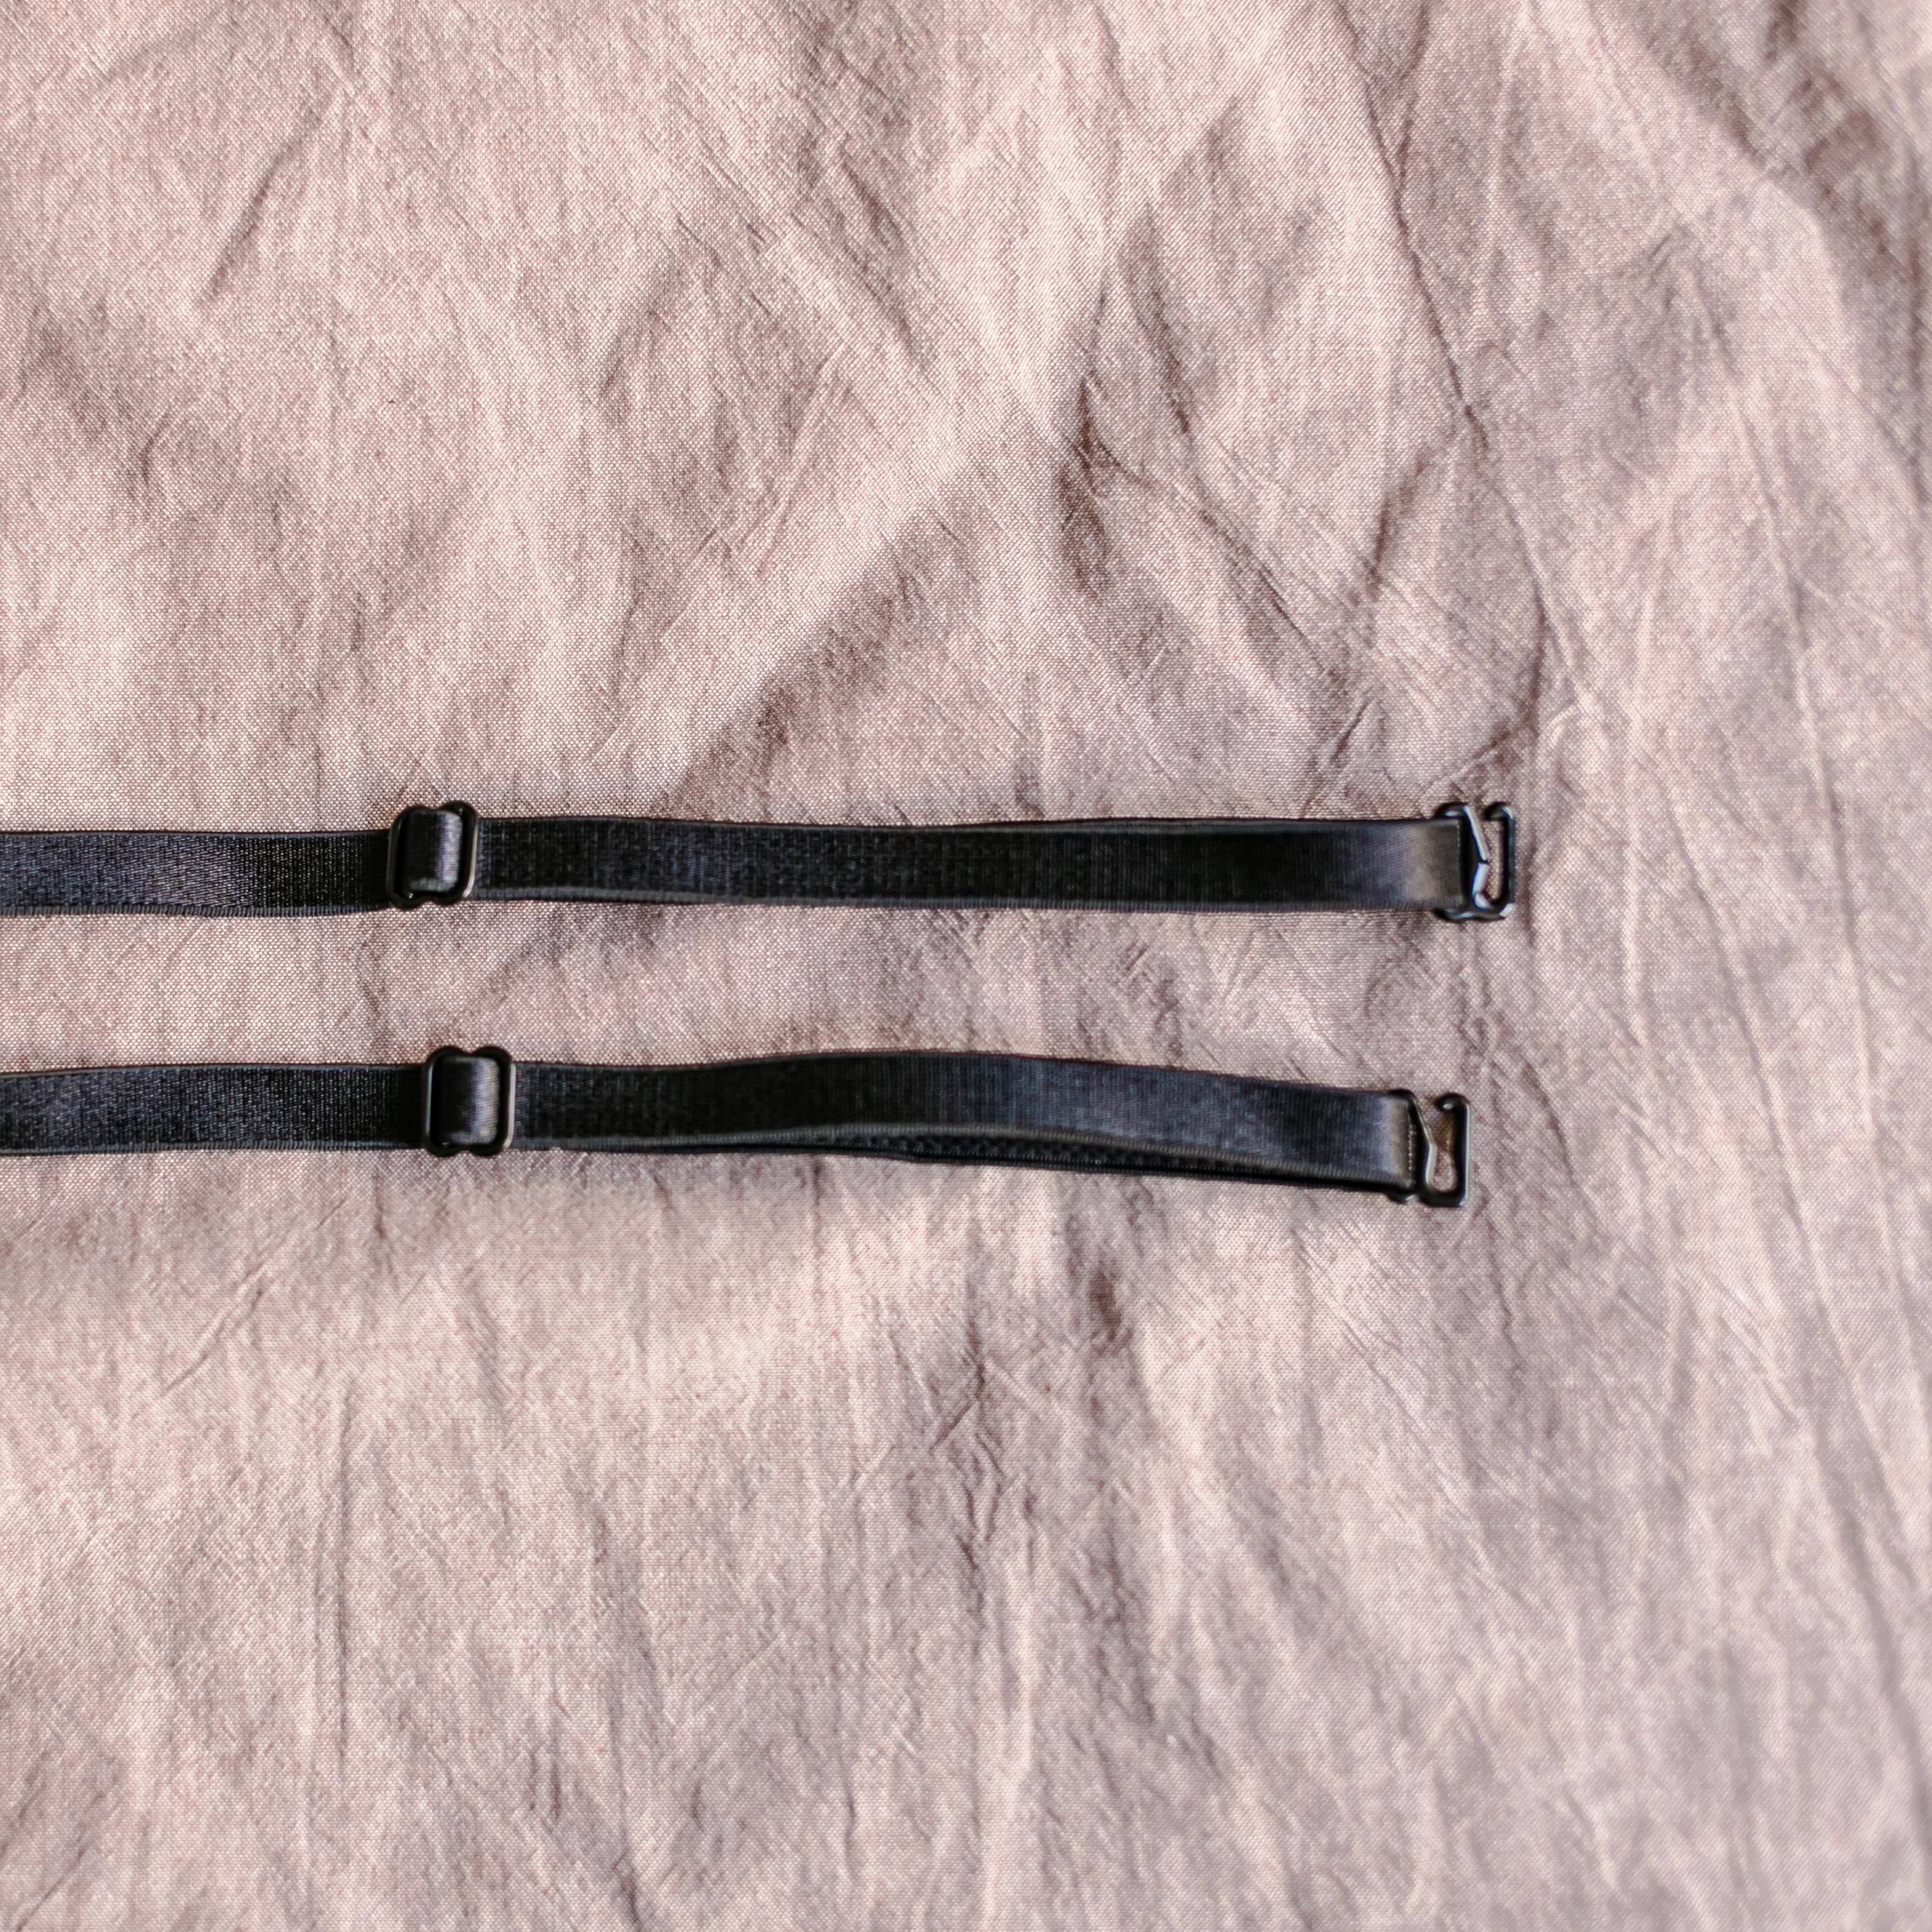 Upbra® Convertible Bra - Adjustable straps